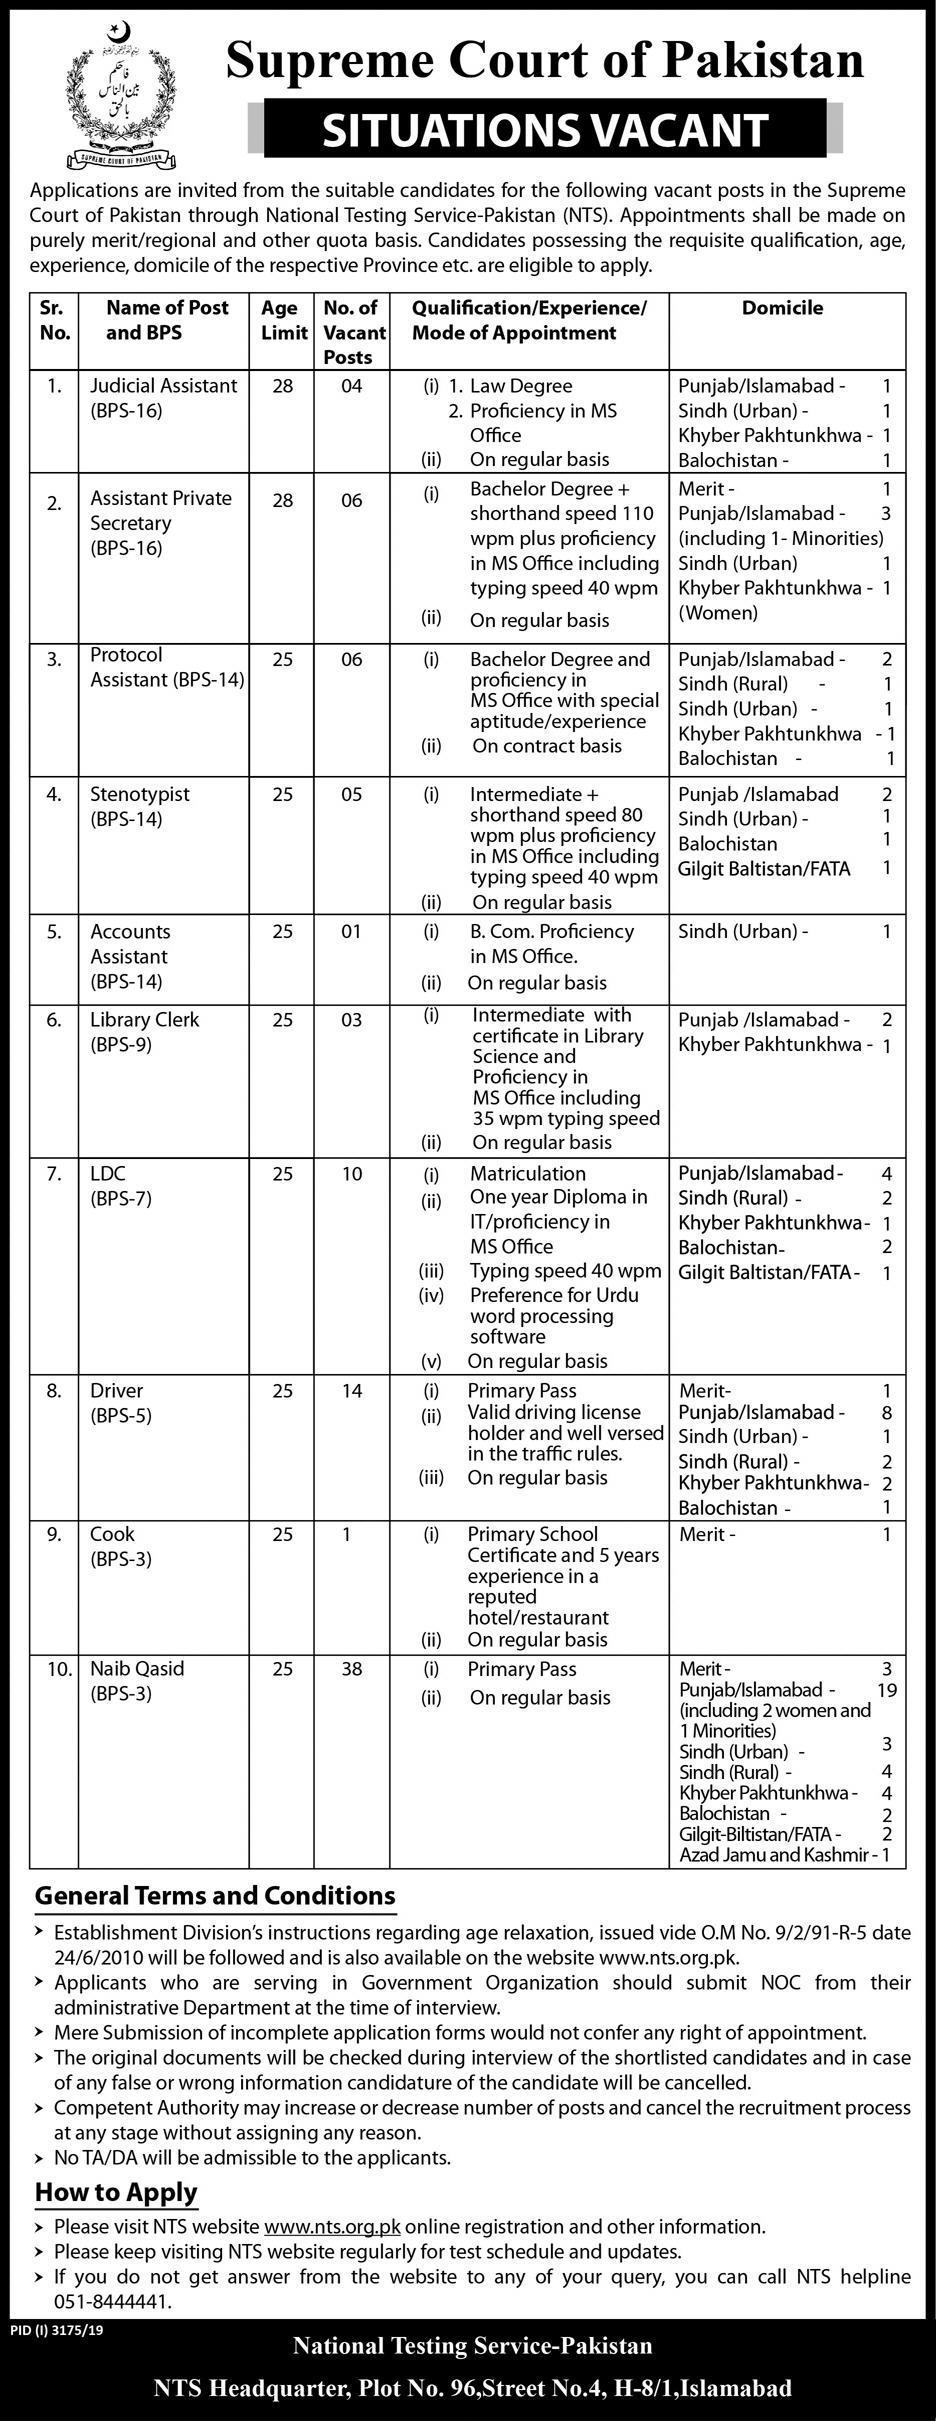 Supreme Court of Pakistan Jobs 2020, NTS Form Download